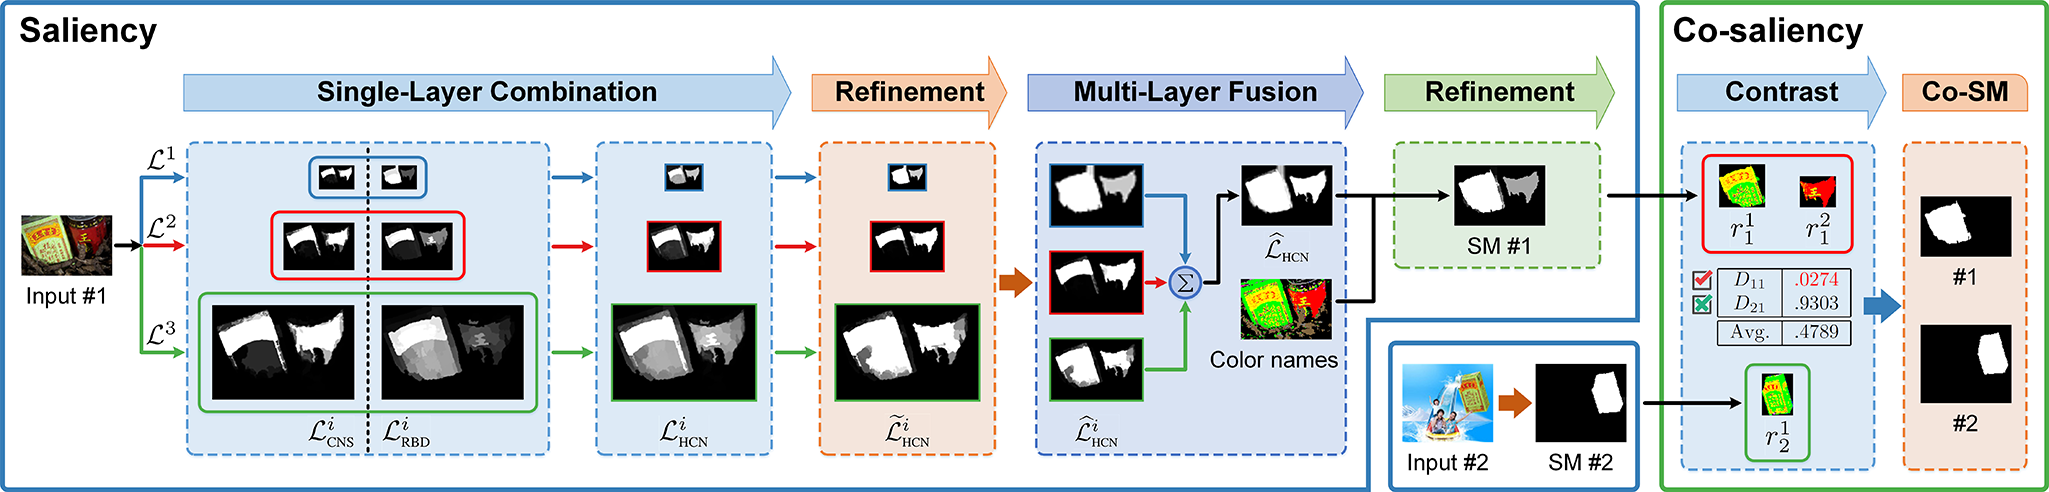 Hierarchical Co-salient Object Detection via Color Names - Pipeline